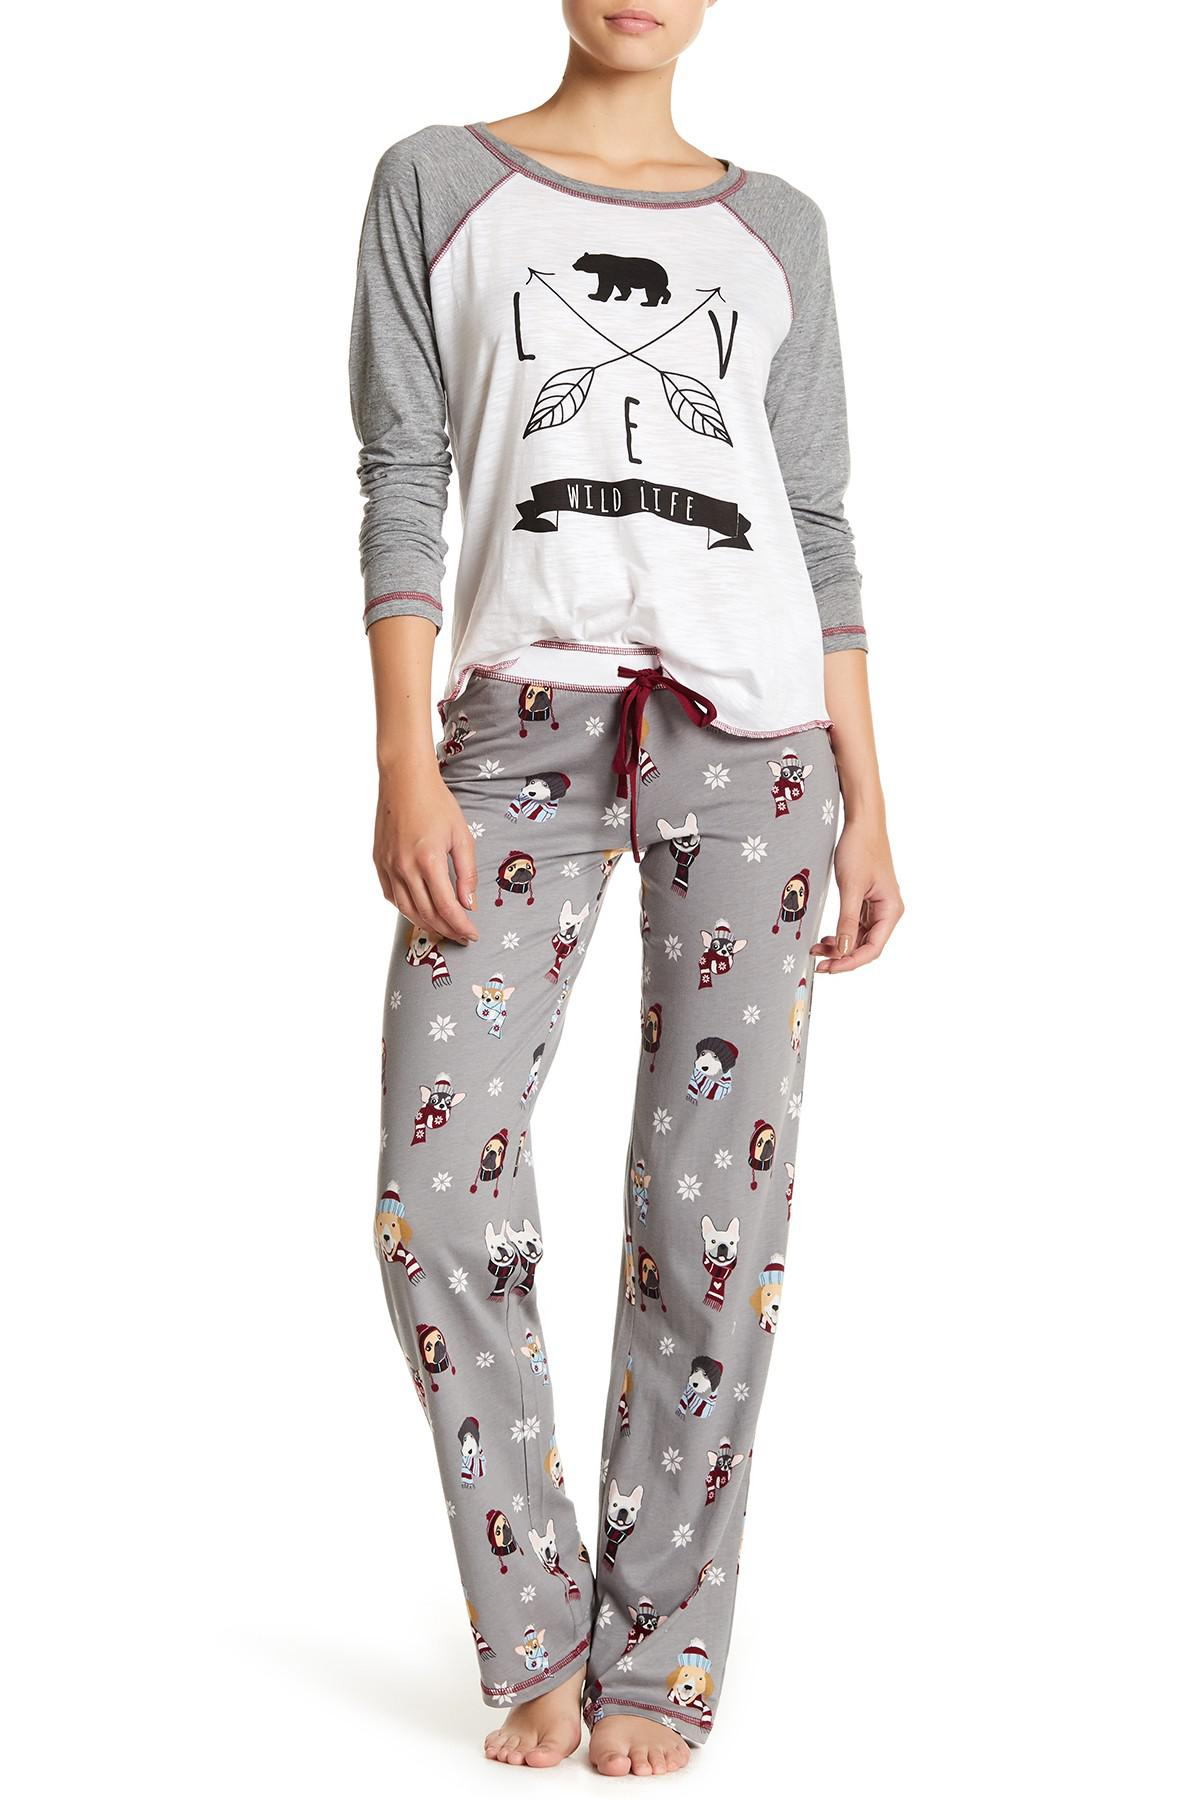 383f66db1 Lyst - Pj Salvage Bundled Dog Print Drawstring Pants in Gray